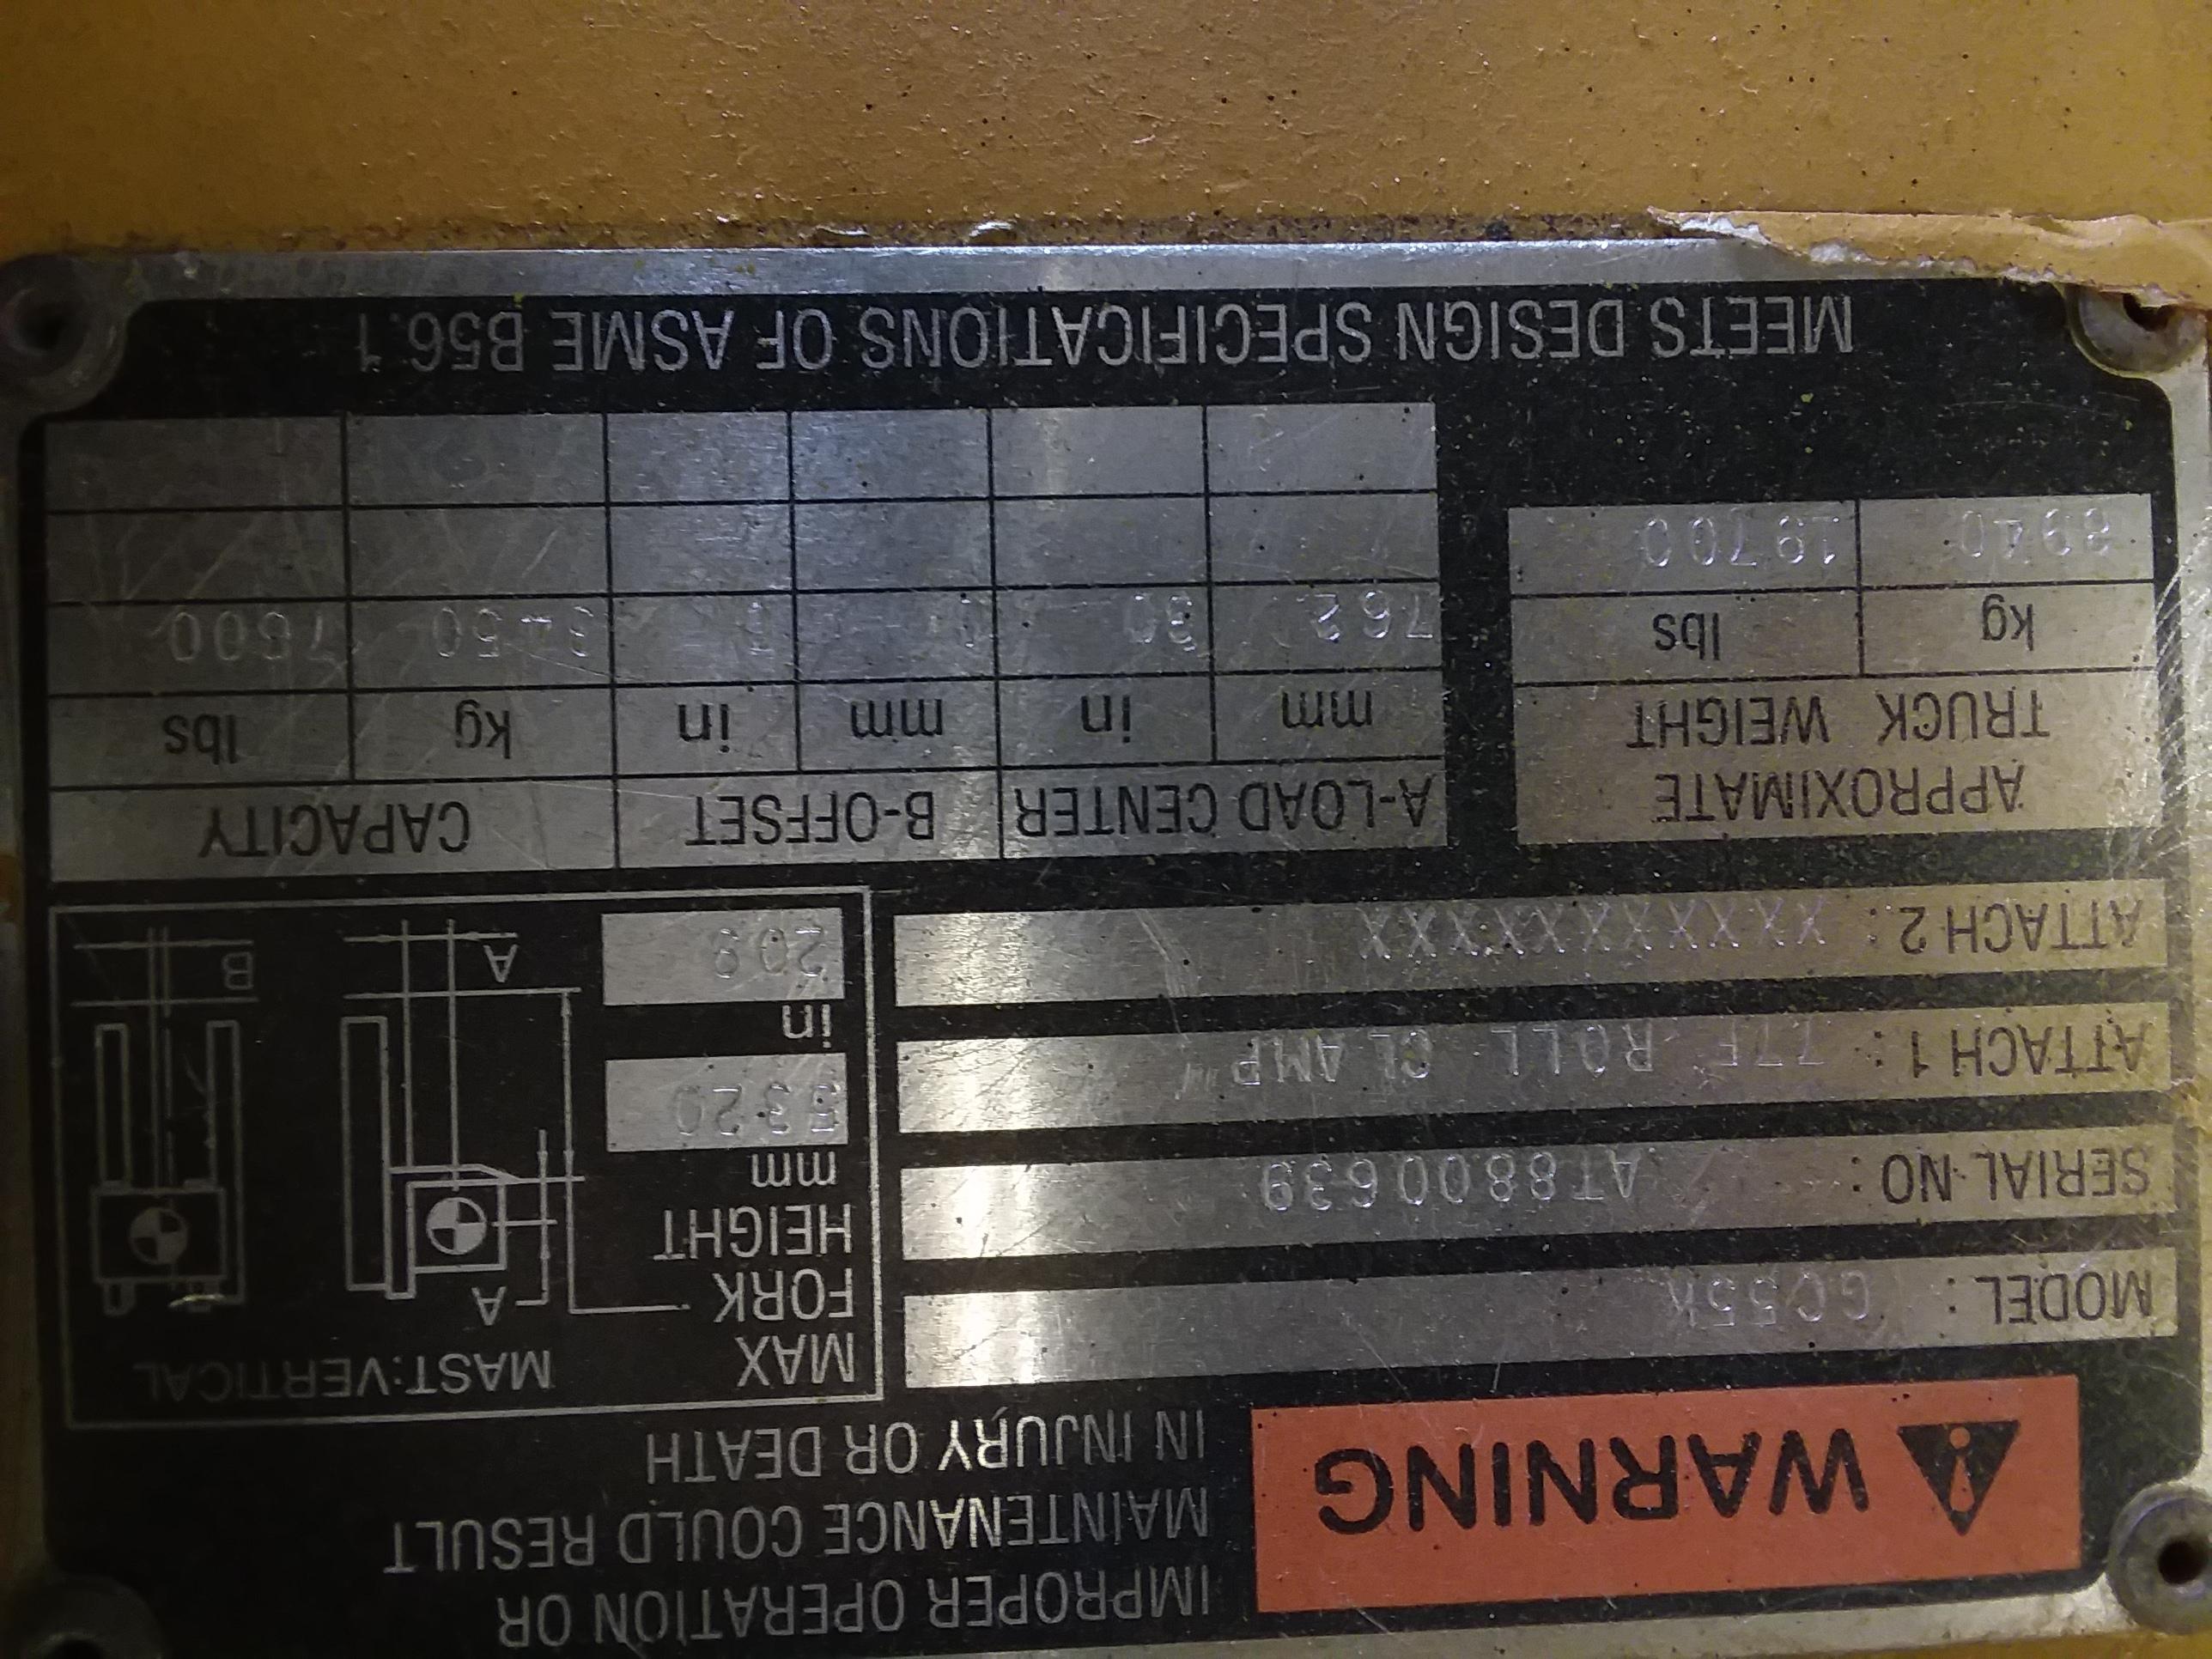 1 - PREOWNED CATERPILLAR 12000 LB LP FORKLIFT